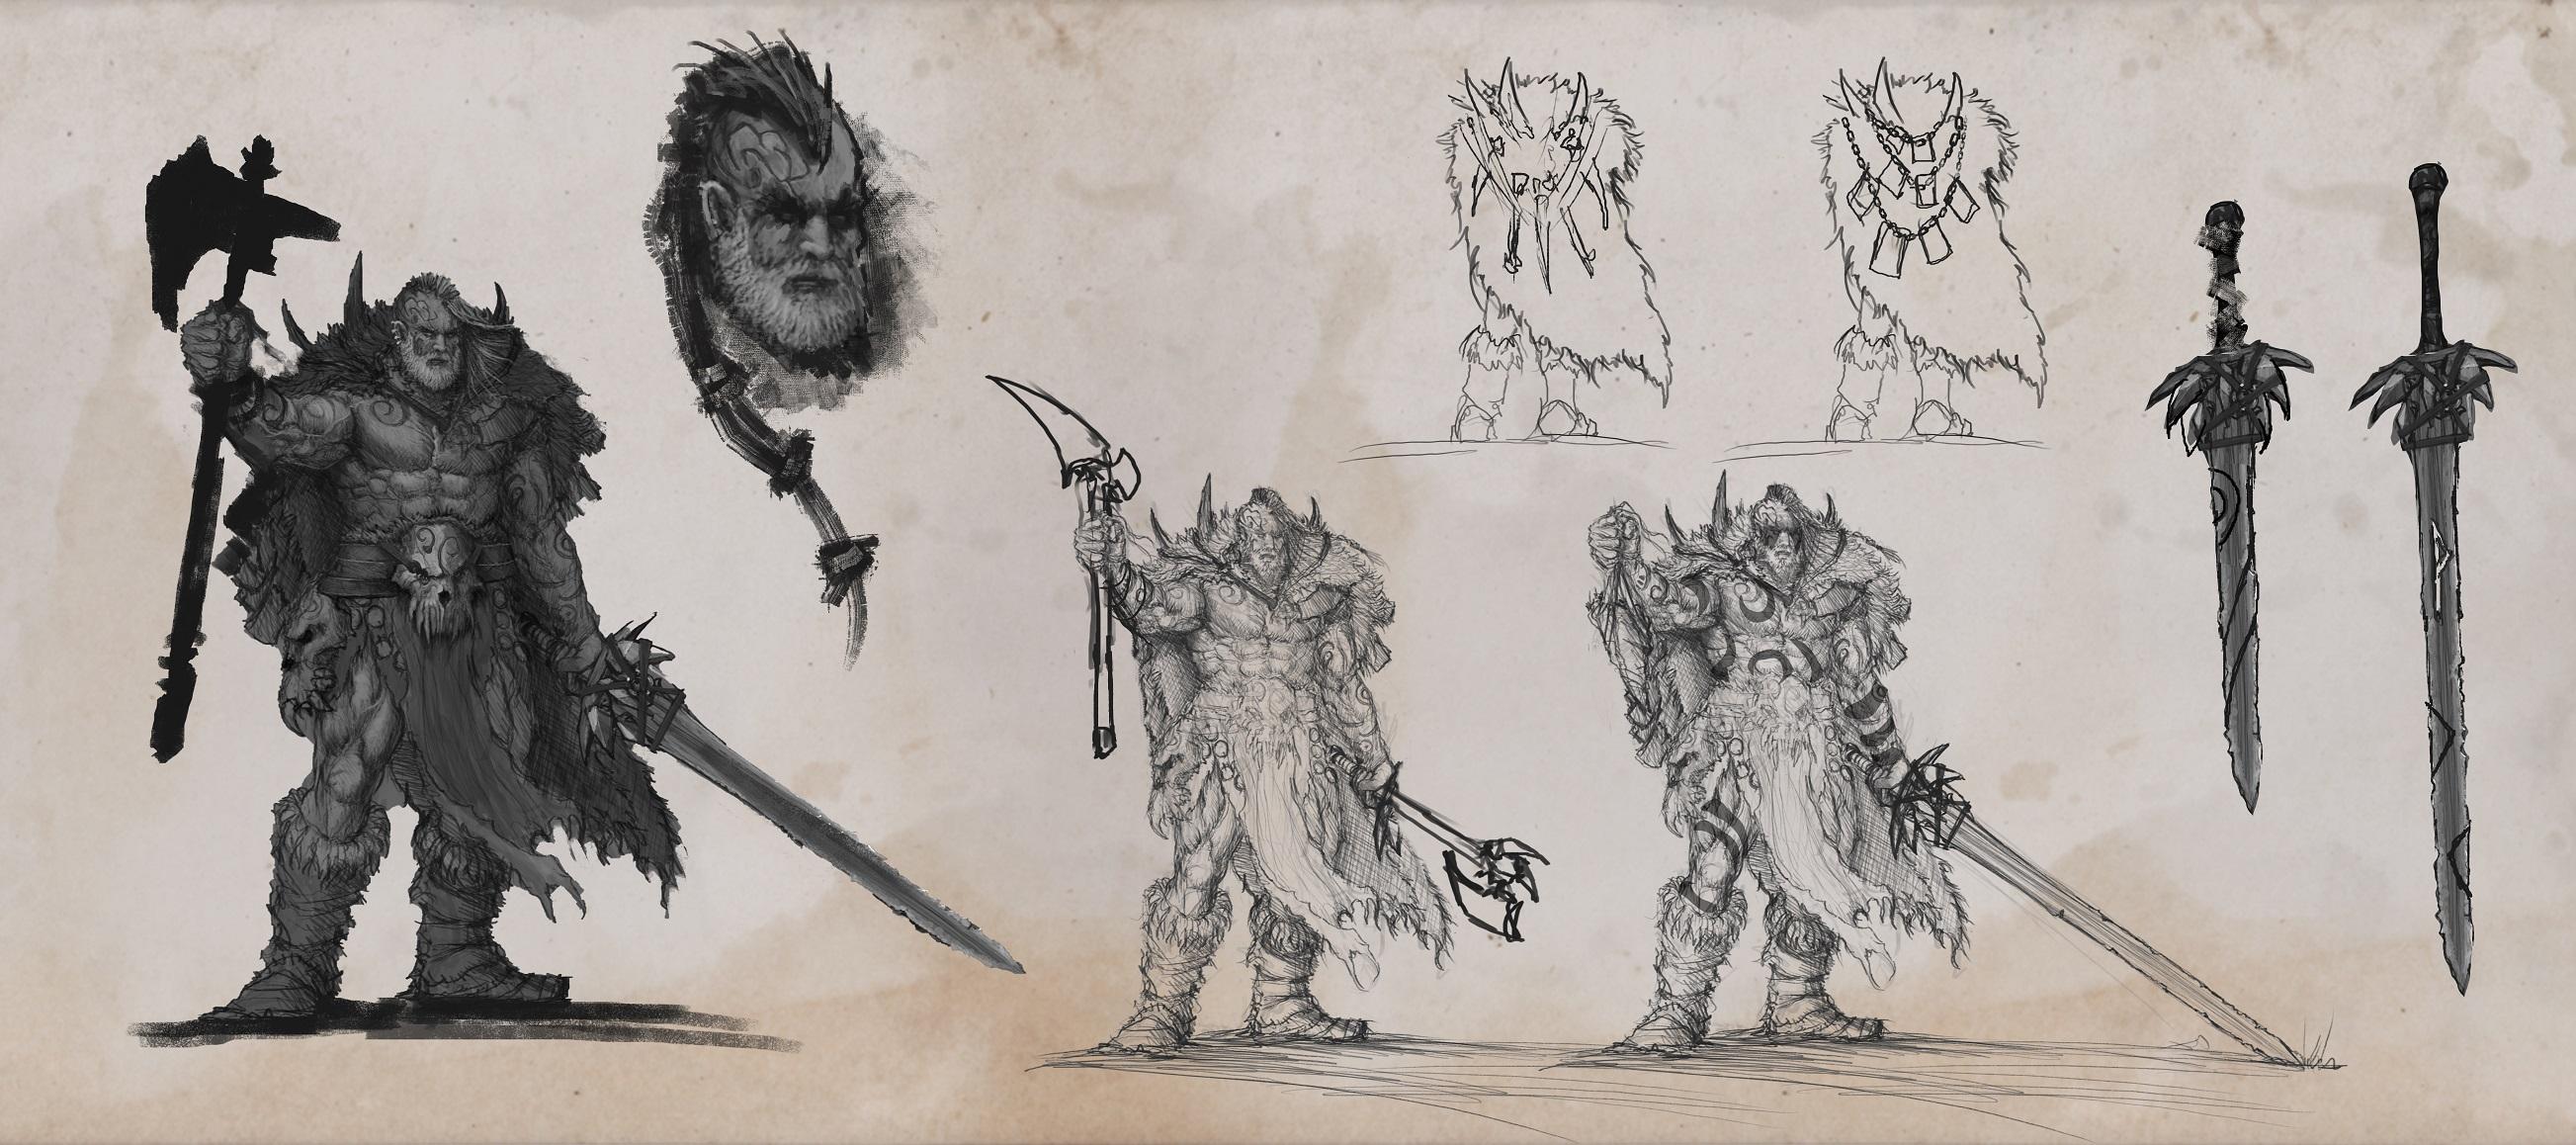 ARNHEIM CONCEPT ART Characters